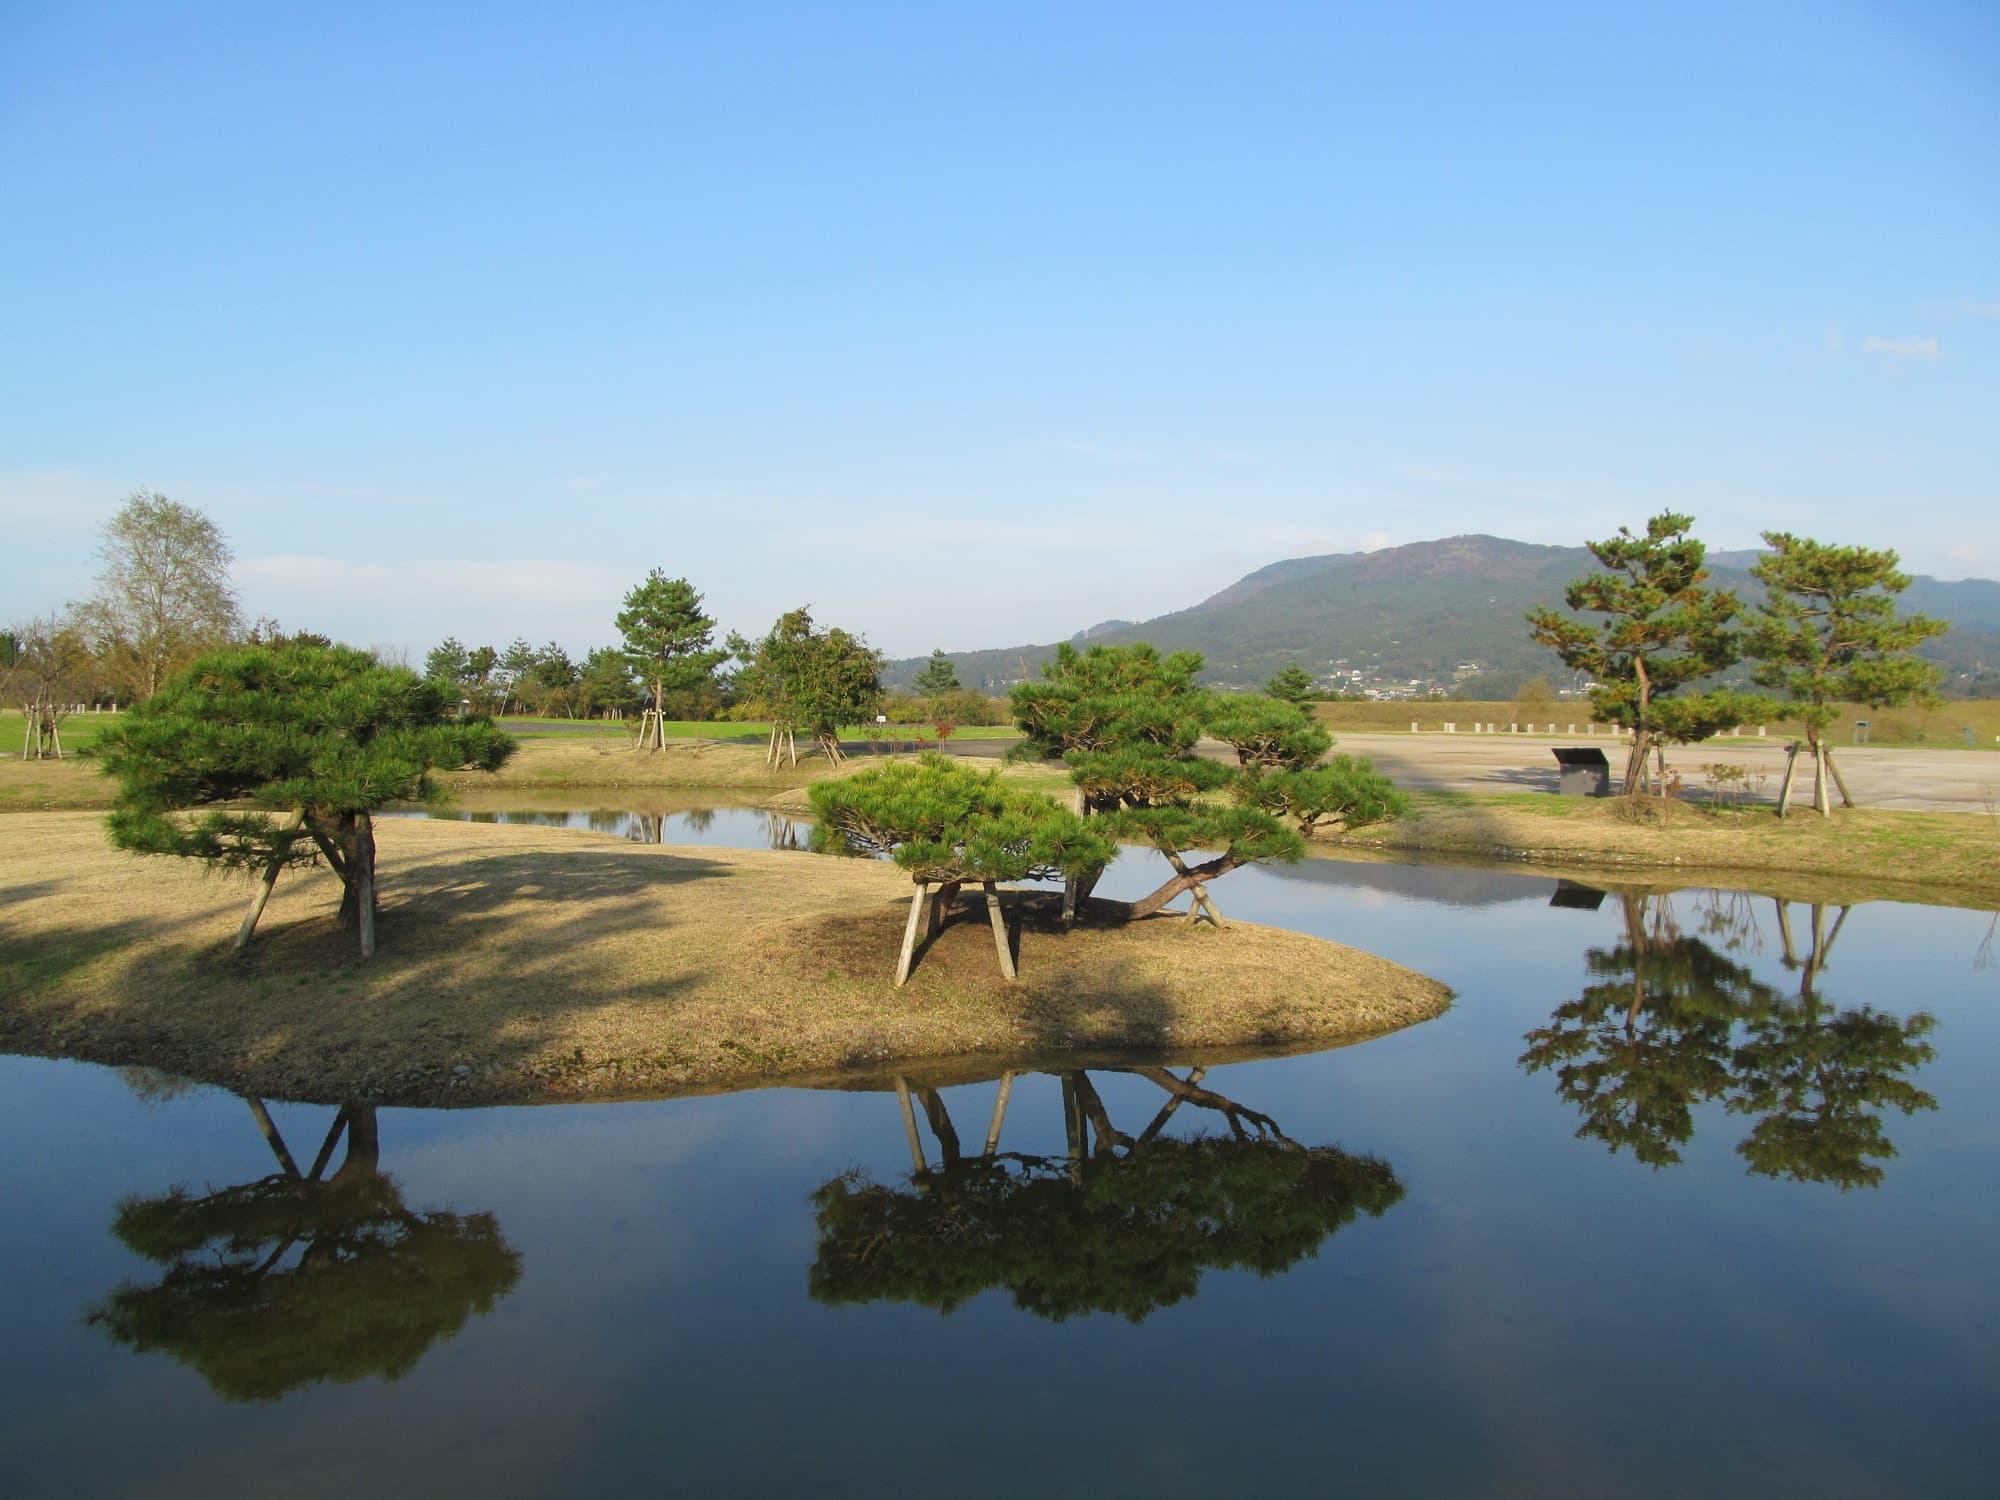 View of Yanagigosho Ruins